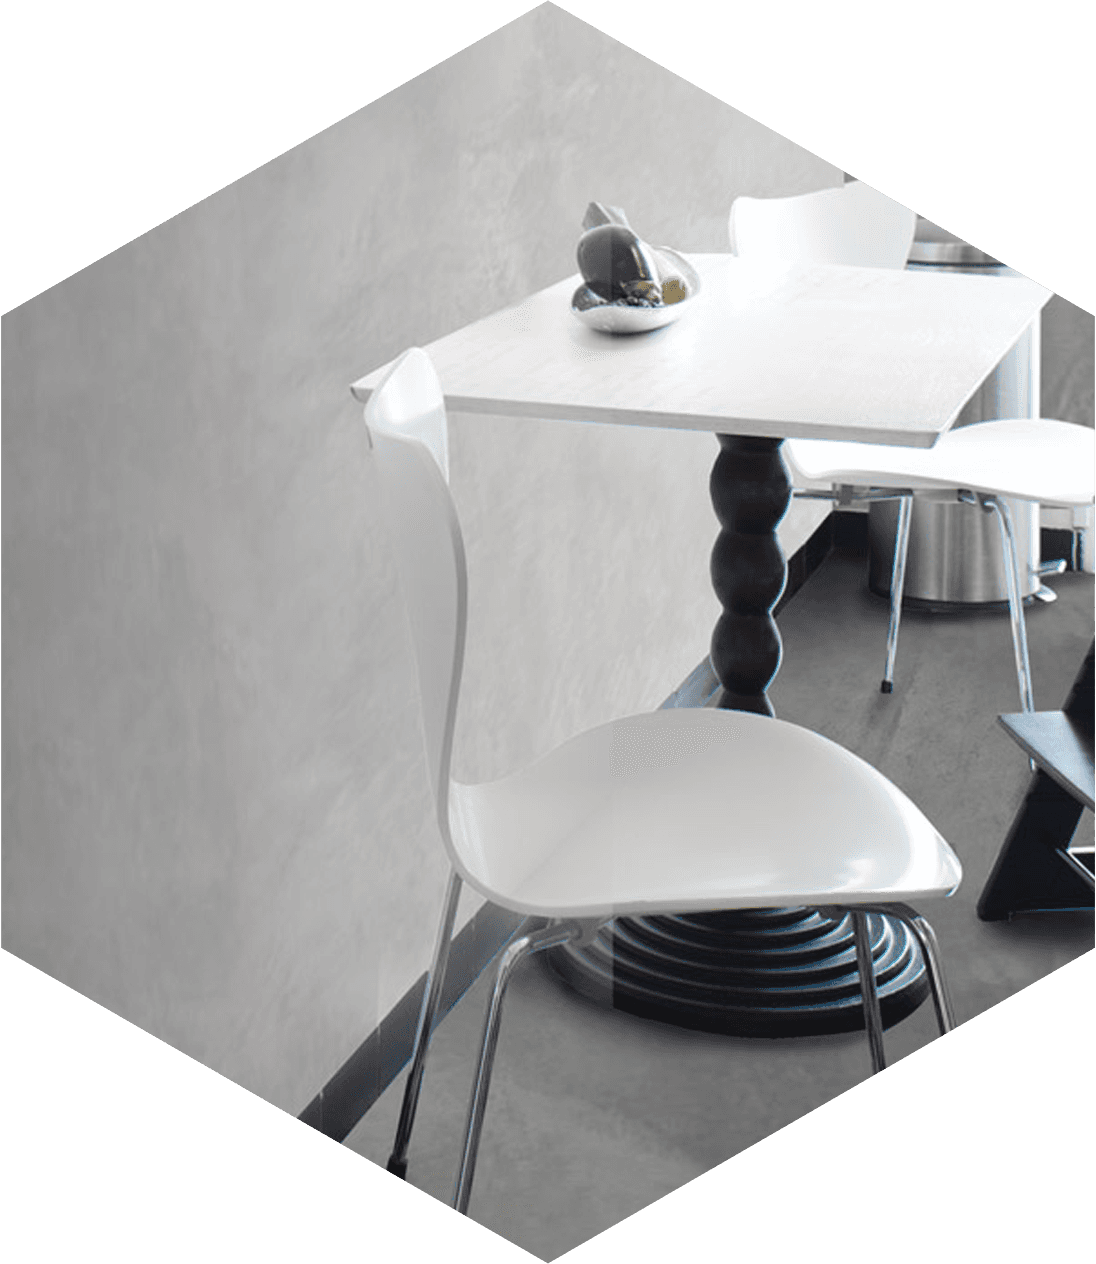 tavolo bianco e sedie